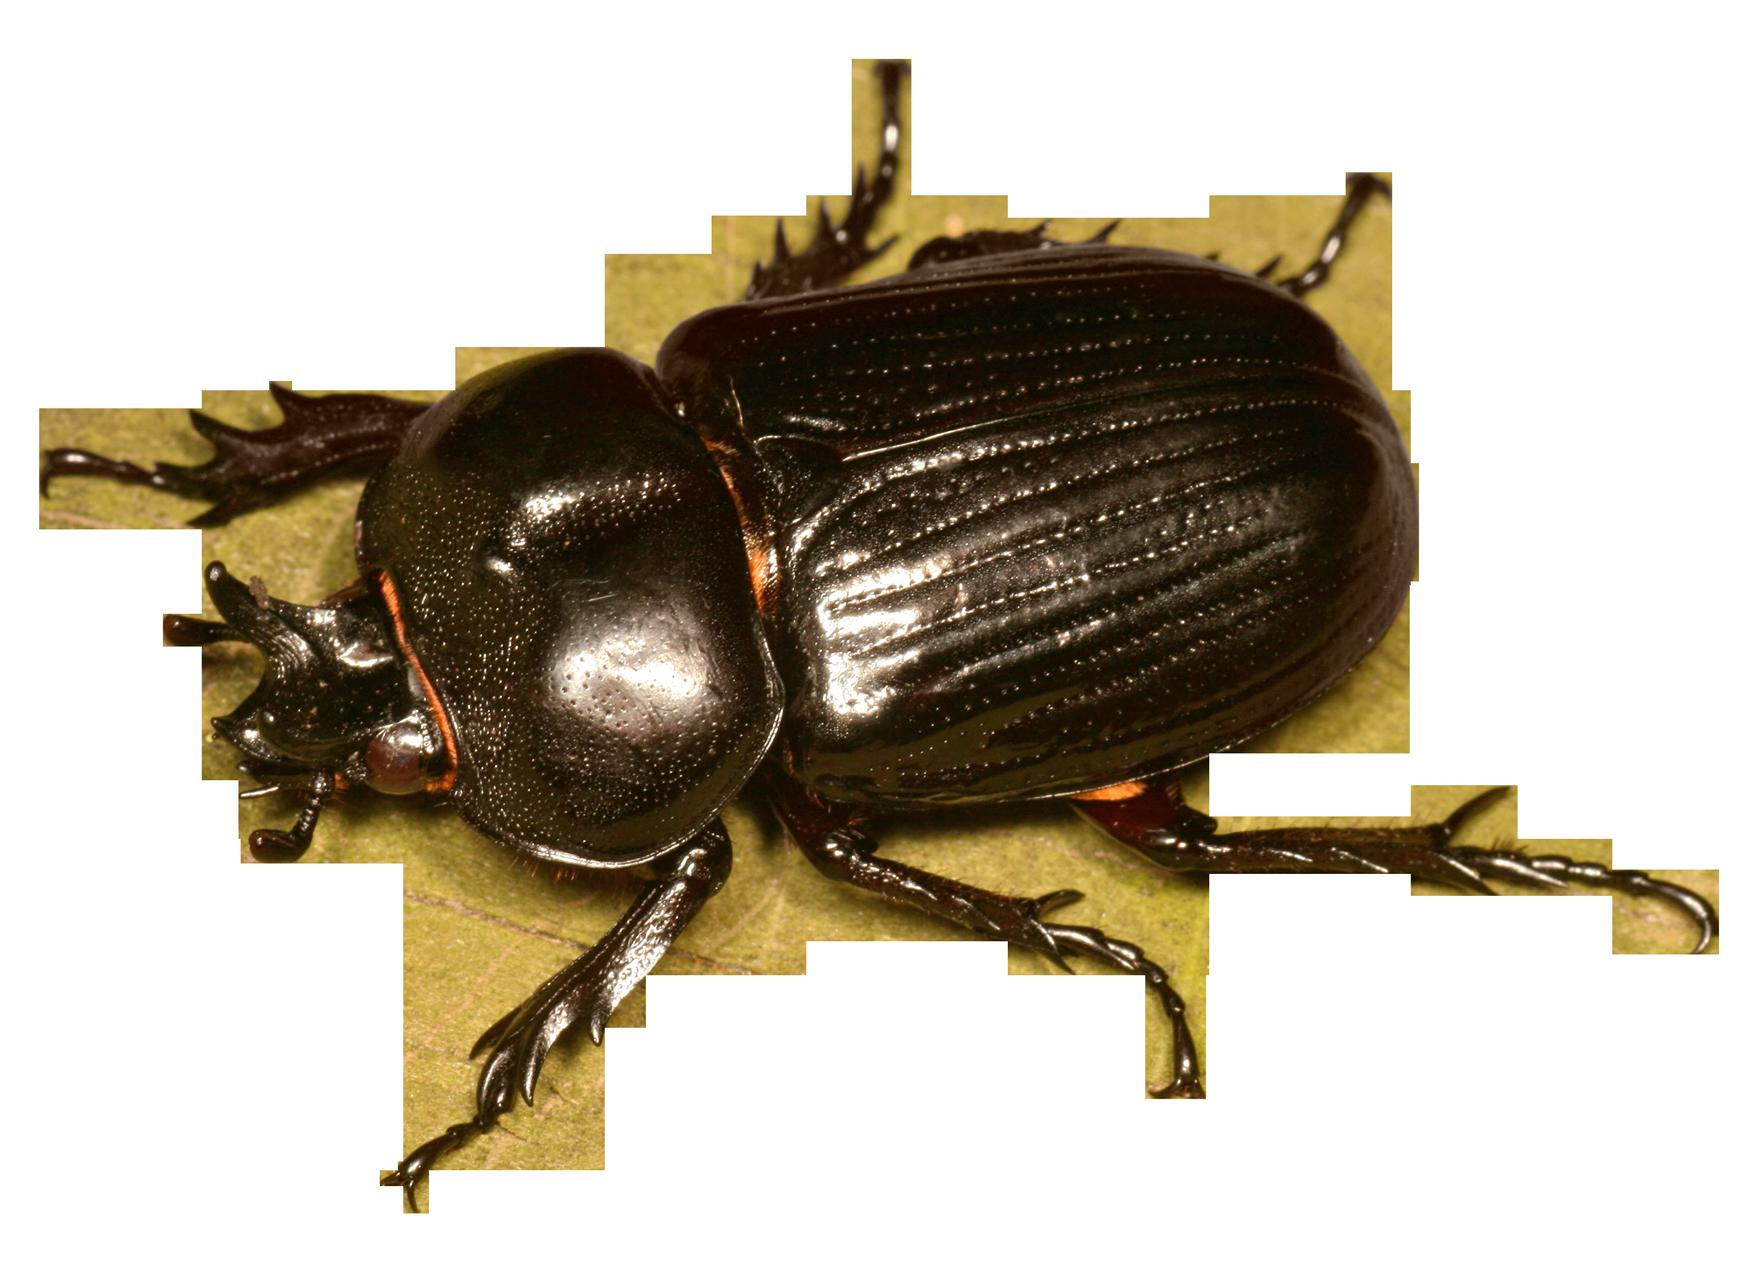 Beetle Bug PNG Transparent Image - BeeBeetle PNG